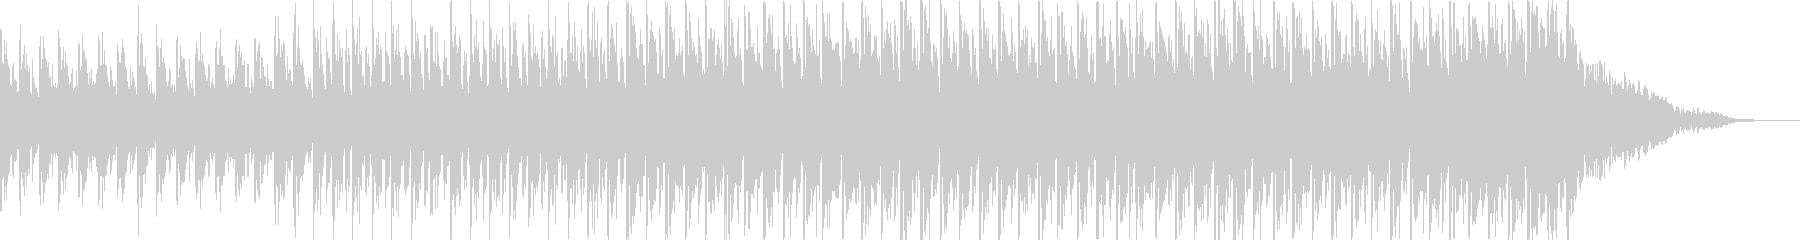 EDMドロップオンリー 10の未再生の波形